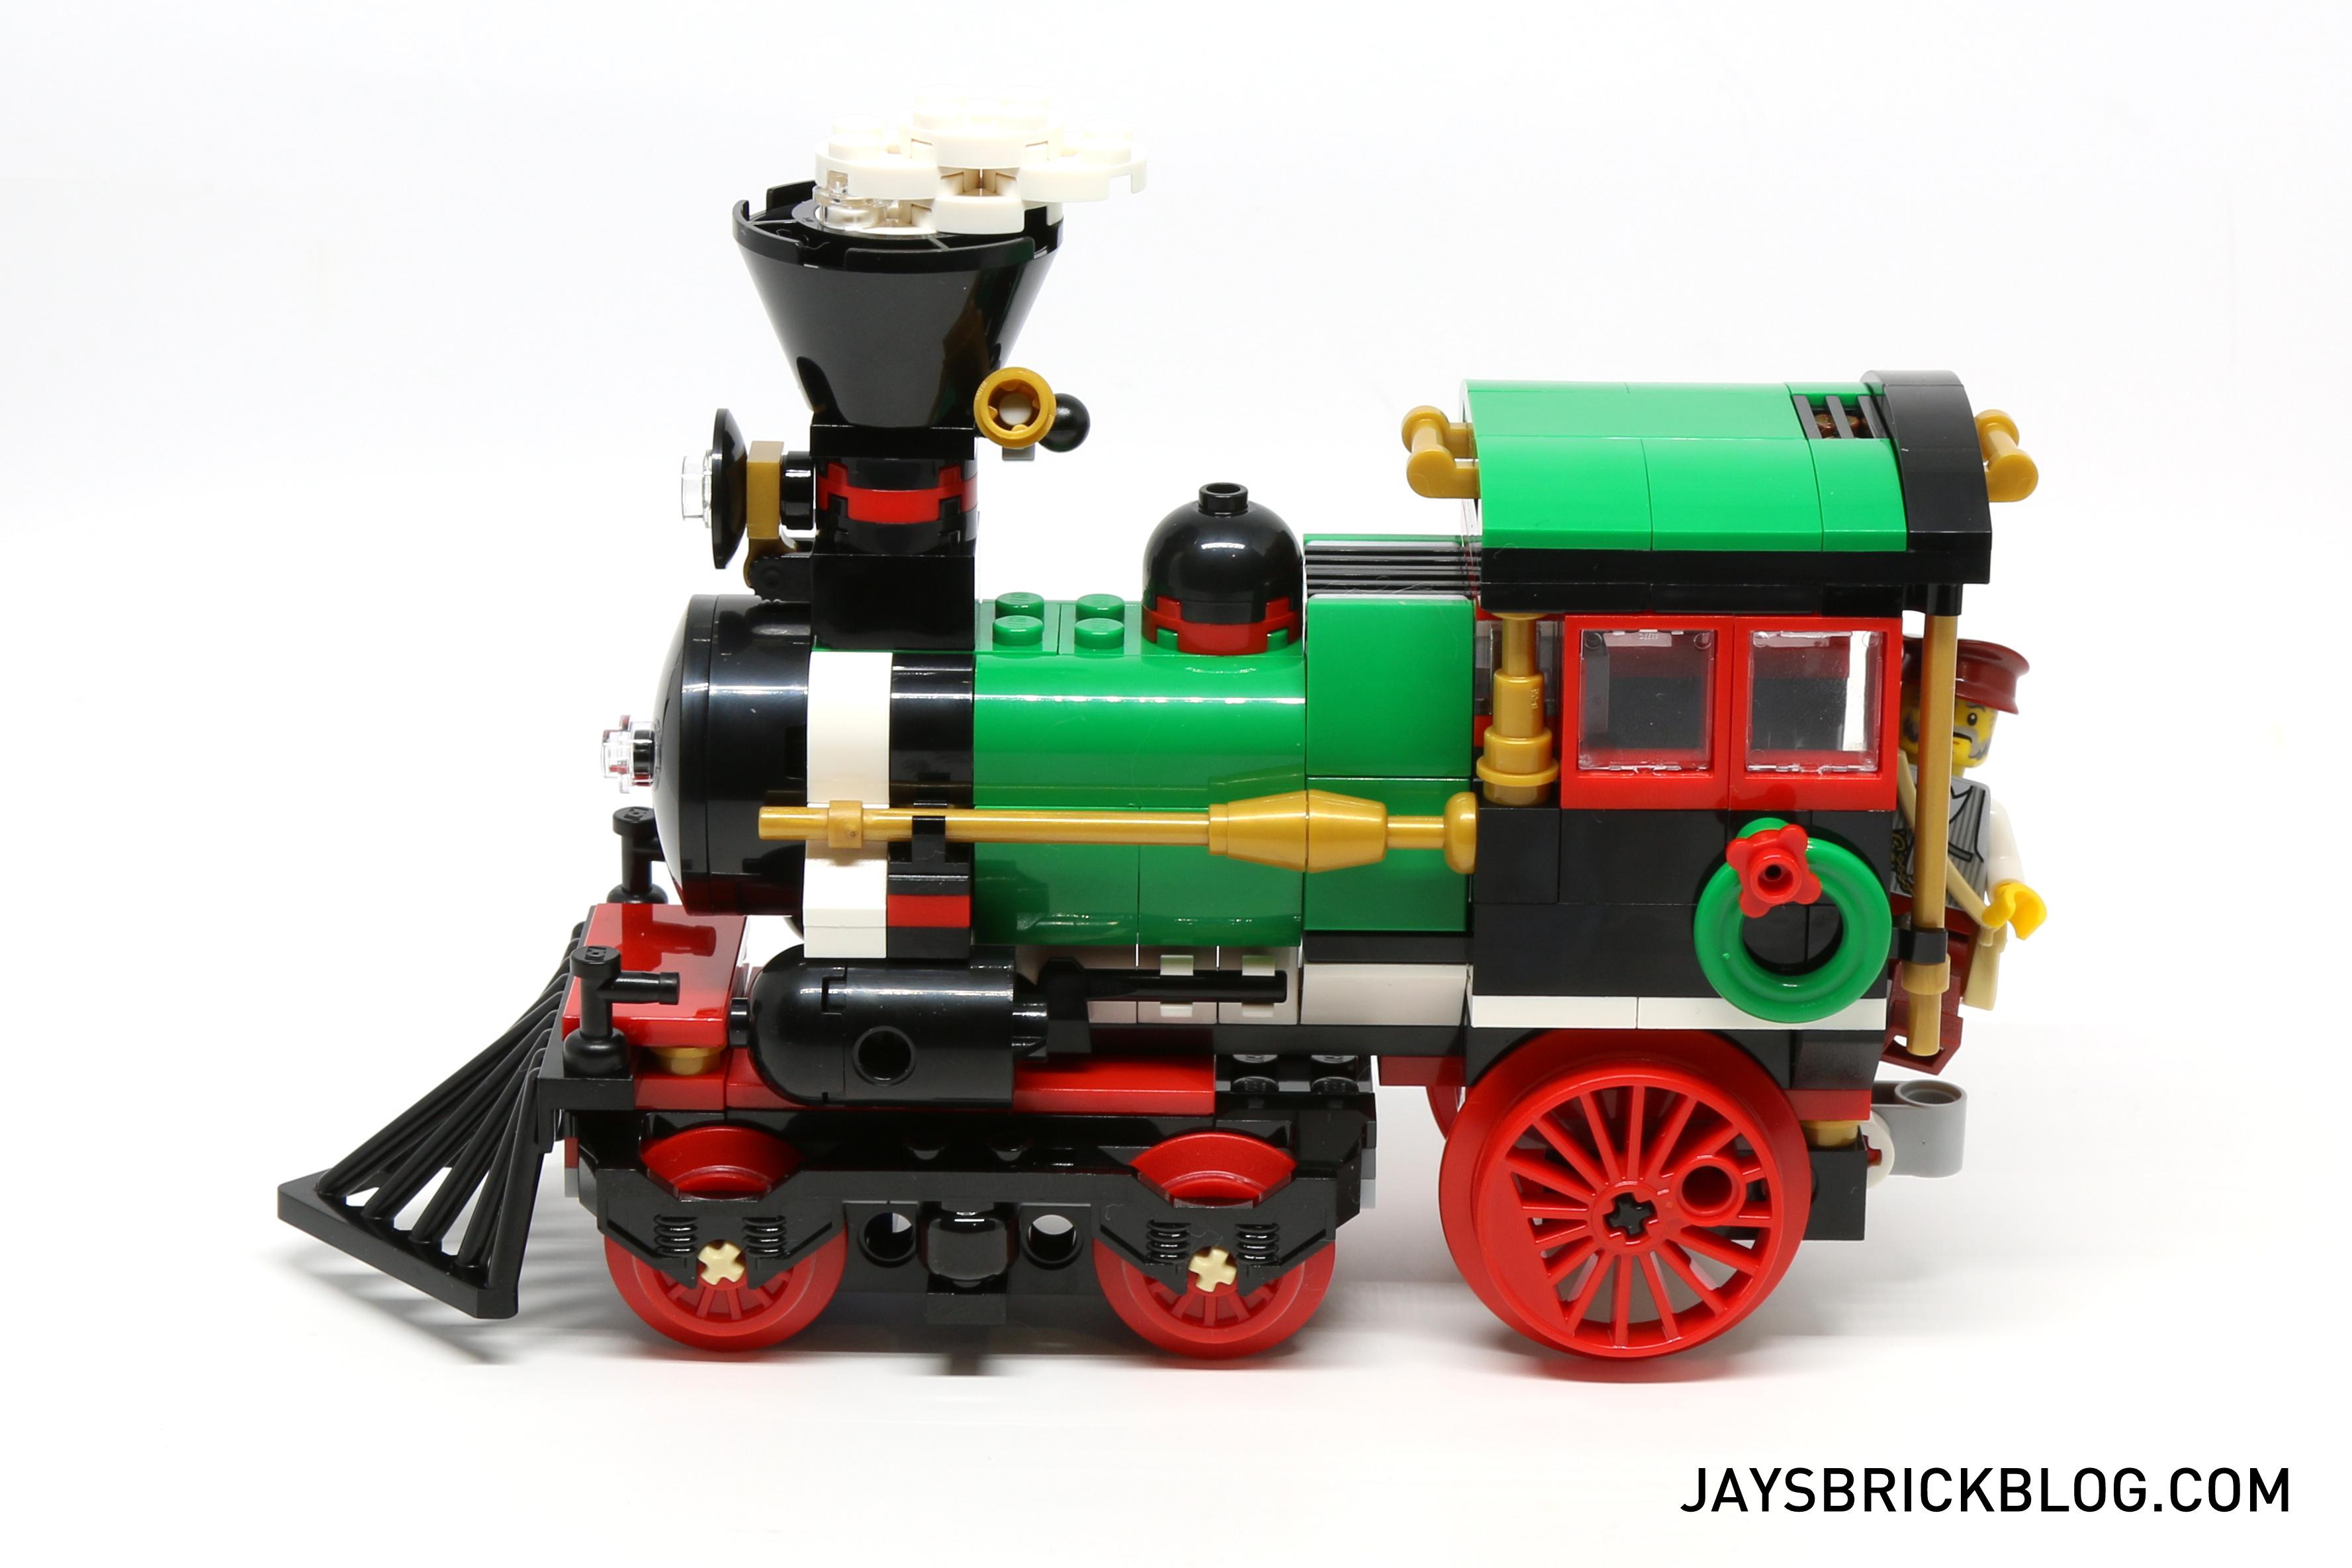 BLUE HOLIDAY MINI TRAIN ENGINE ORNAMENT****** ******NEW LEGO CHRISTMAS